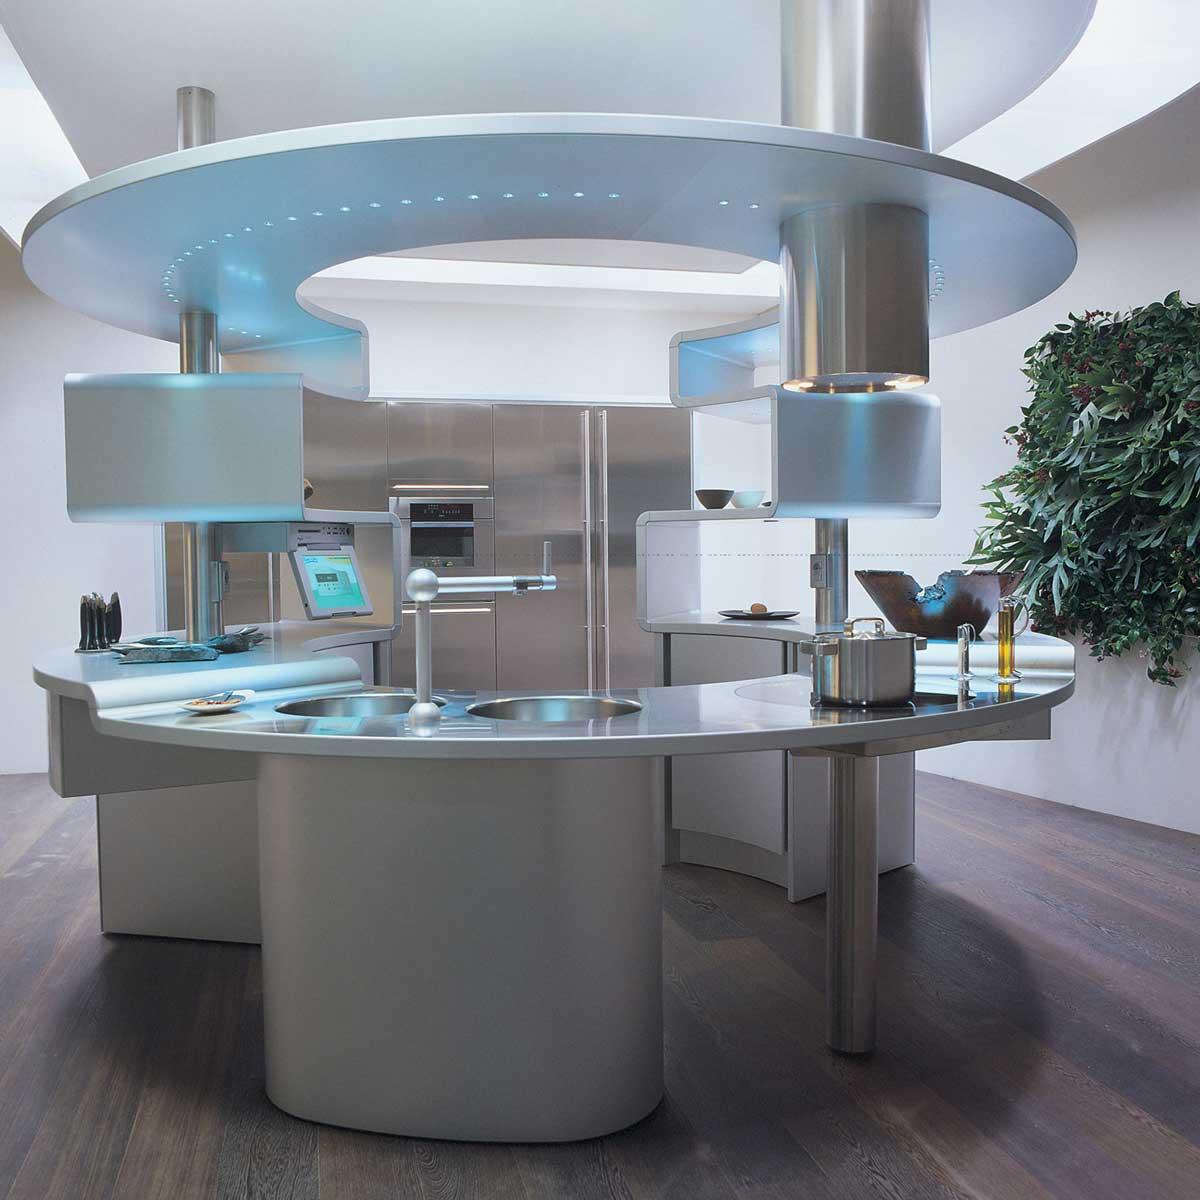 Futuristic Kitchen Stuff: Acropolis - The Kitchen Of The Future